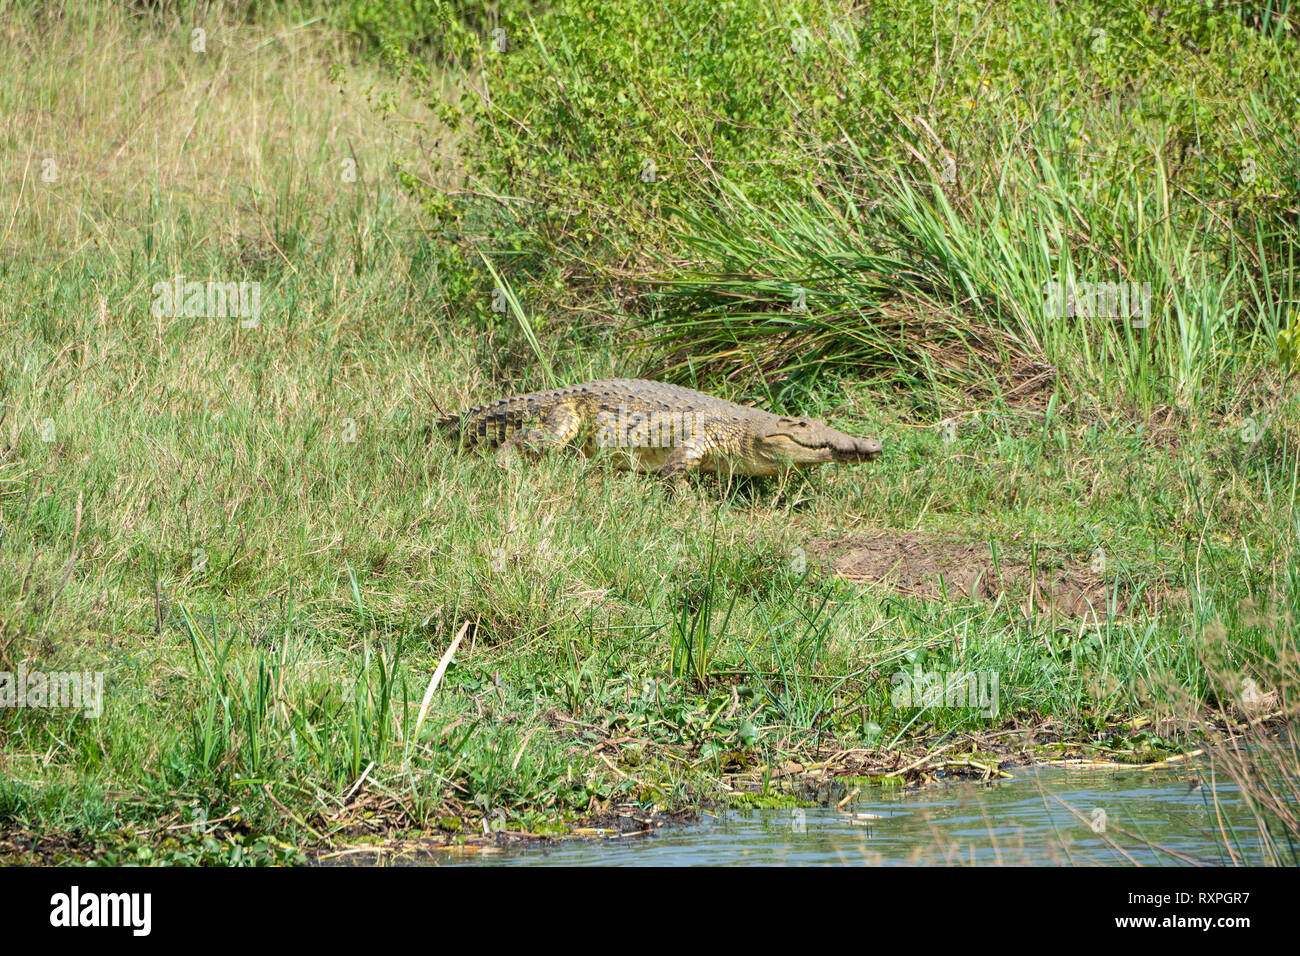 Nile crocodile (Crocodylus niloticus) heading towards Victoria Nile river in Murchison Falls National Park, Northern Uganda, East Africa - Stock Image